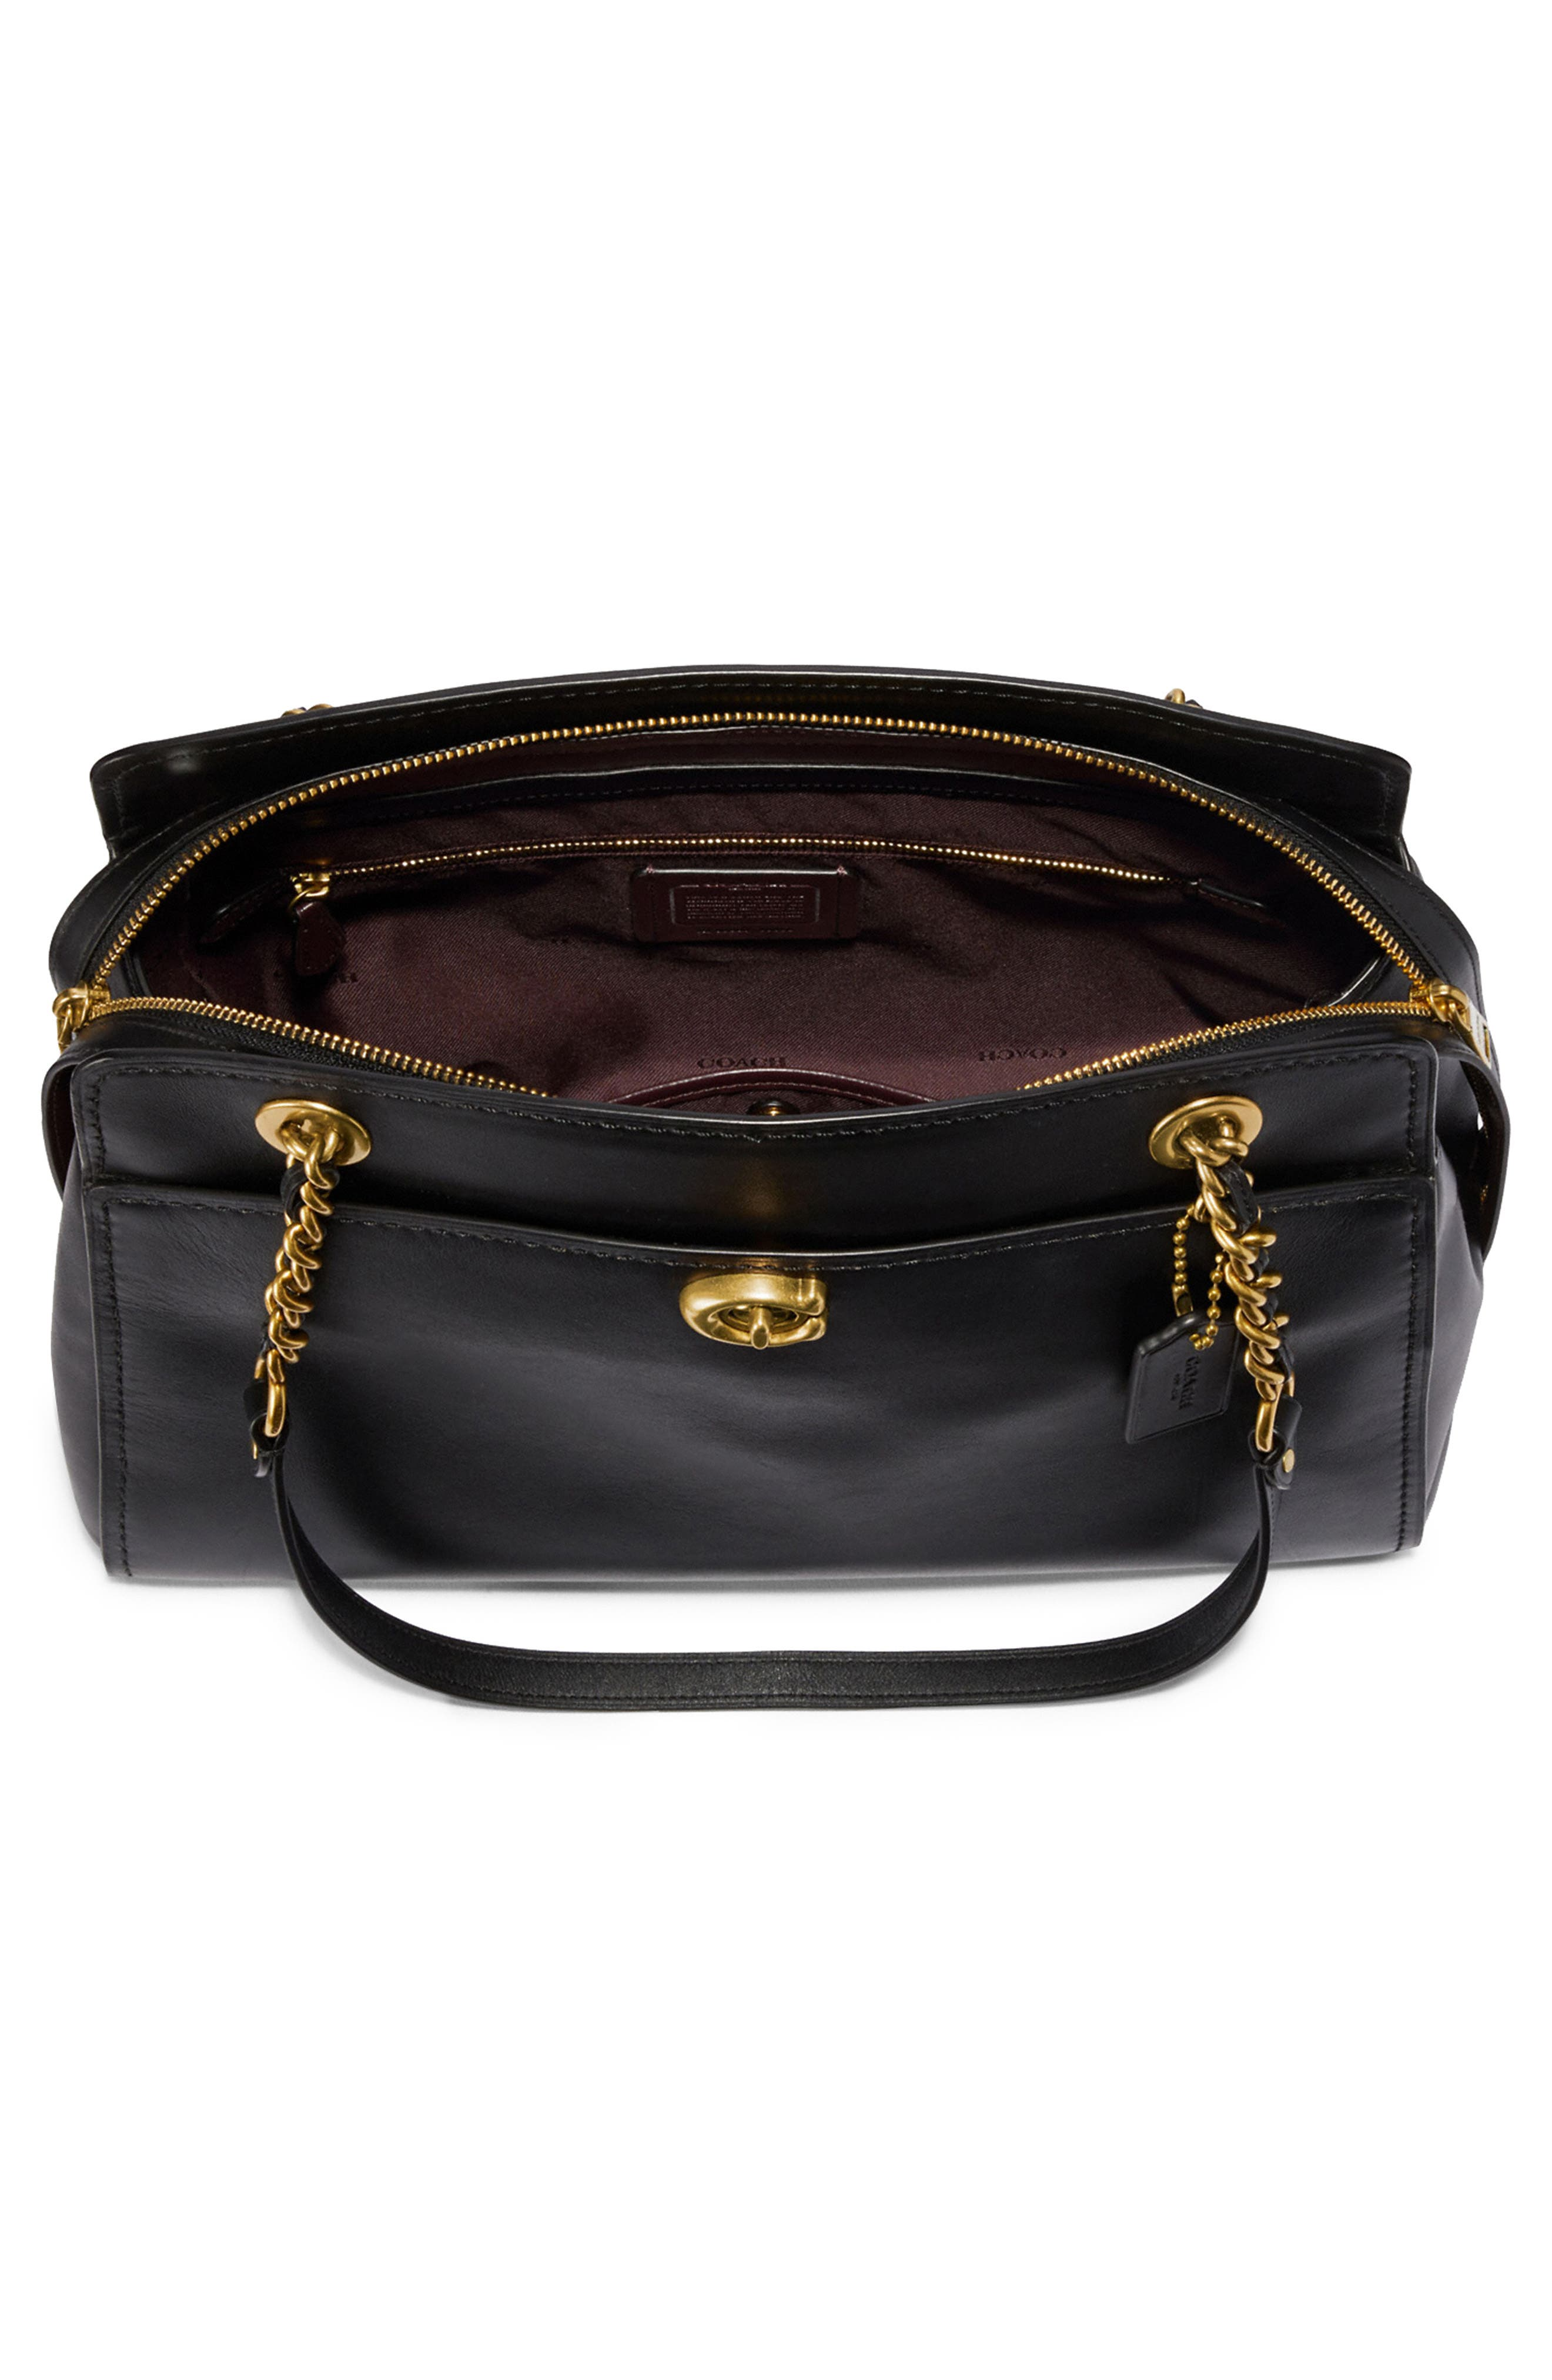 COACH,                             Parker Leather Shoulder Bag,                             Alternate thumbnail 3, color,                             BLACK